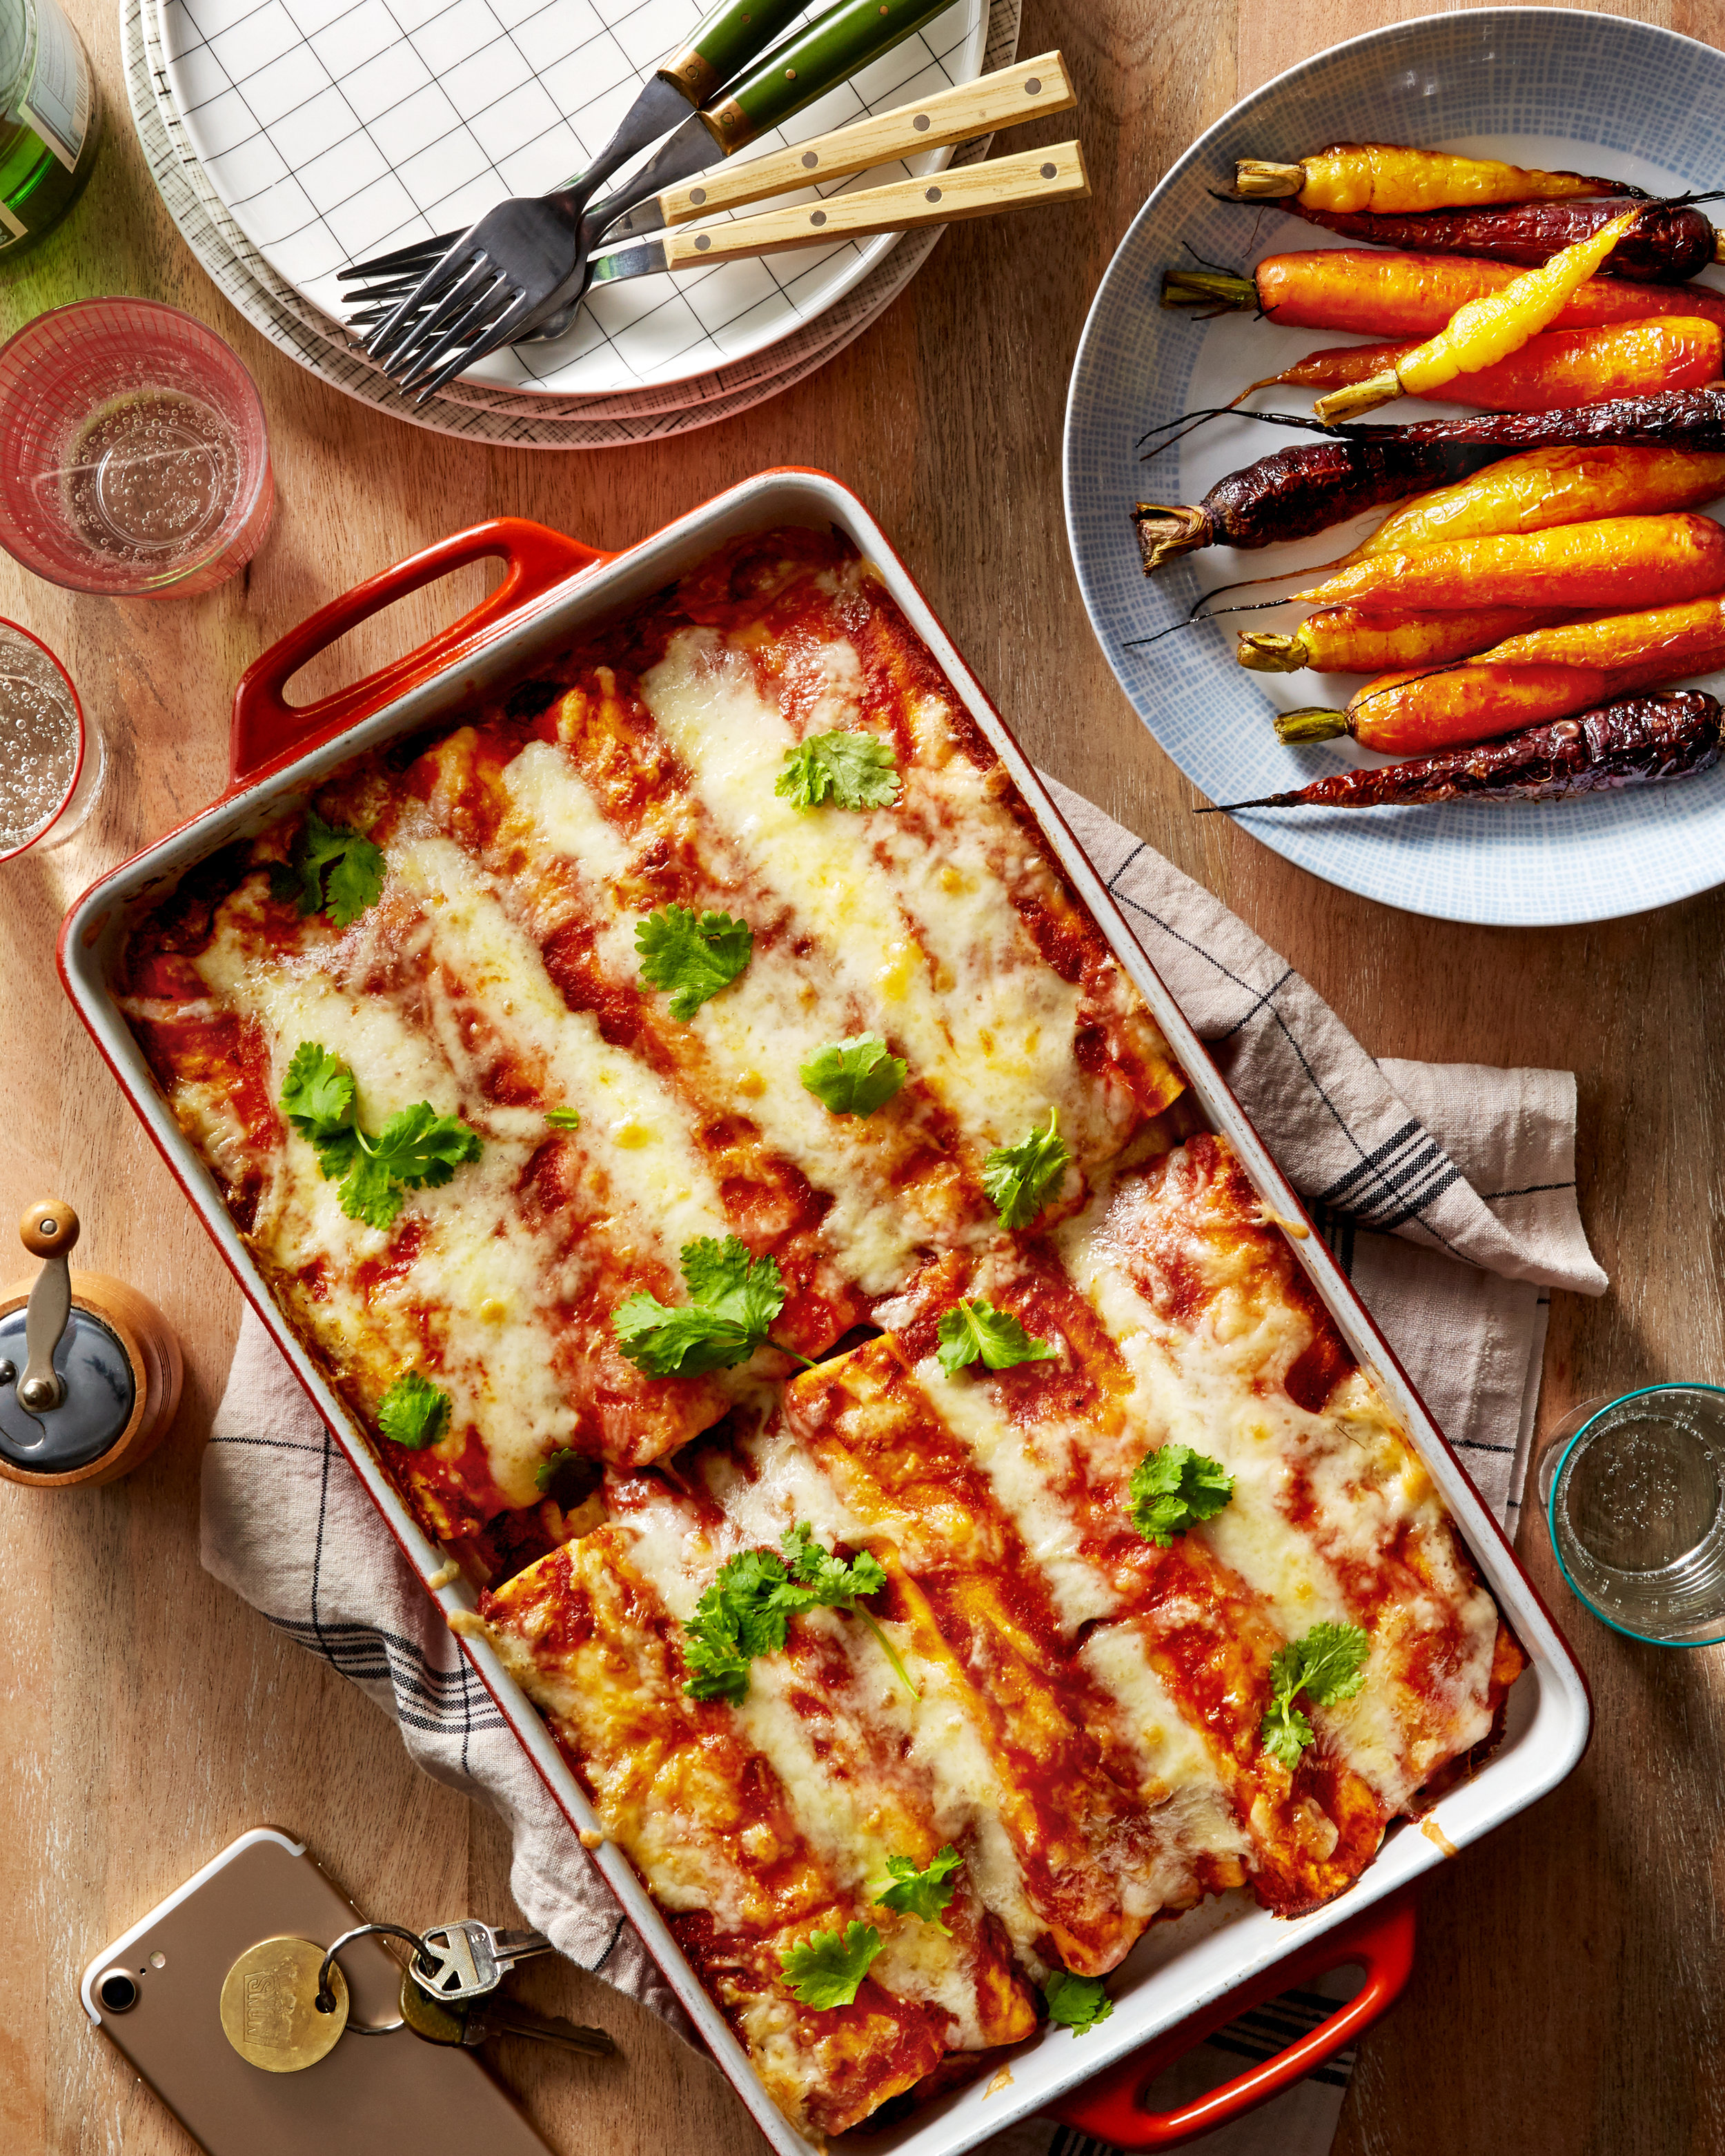 Zucchini-Squash-Enchiladas_Vignette_Droga-2018_0344-Cilantro-Comp.jpg